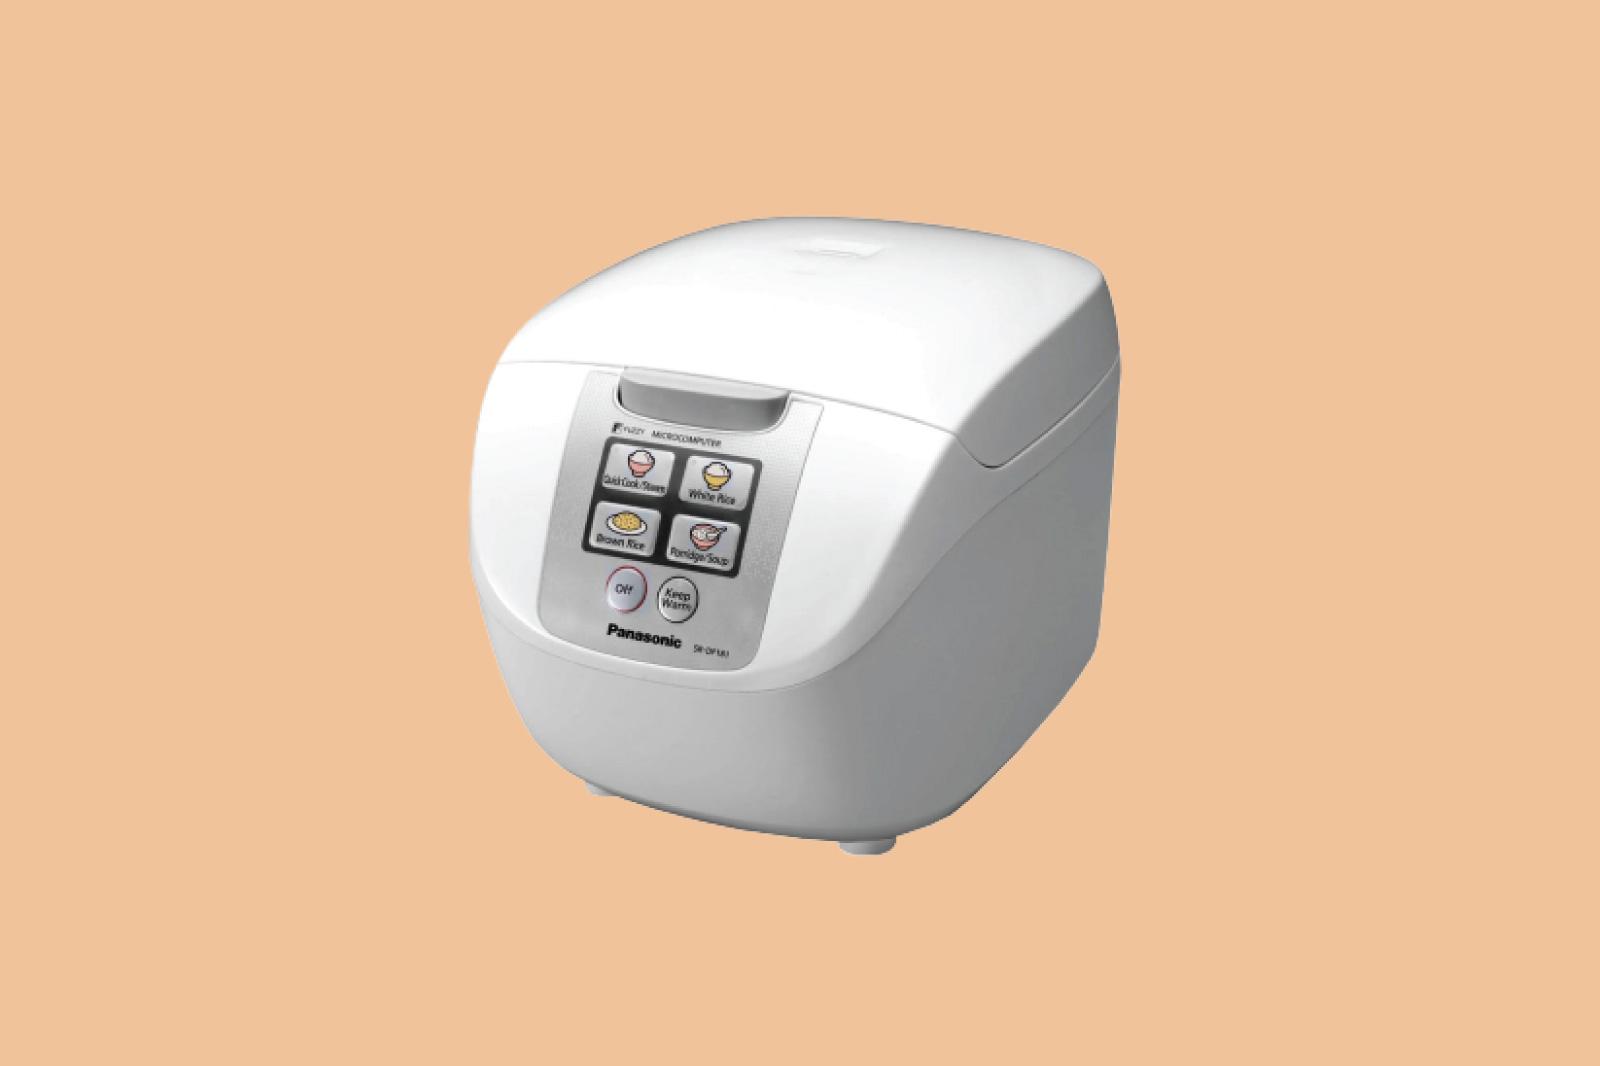 Panasonic SR-DF181WS